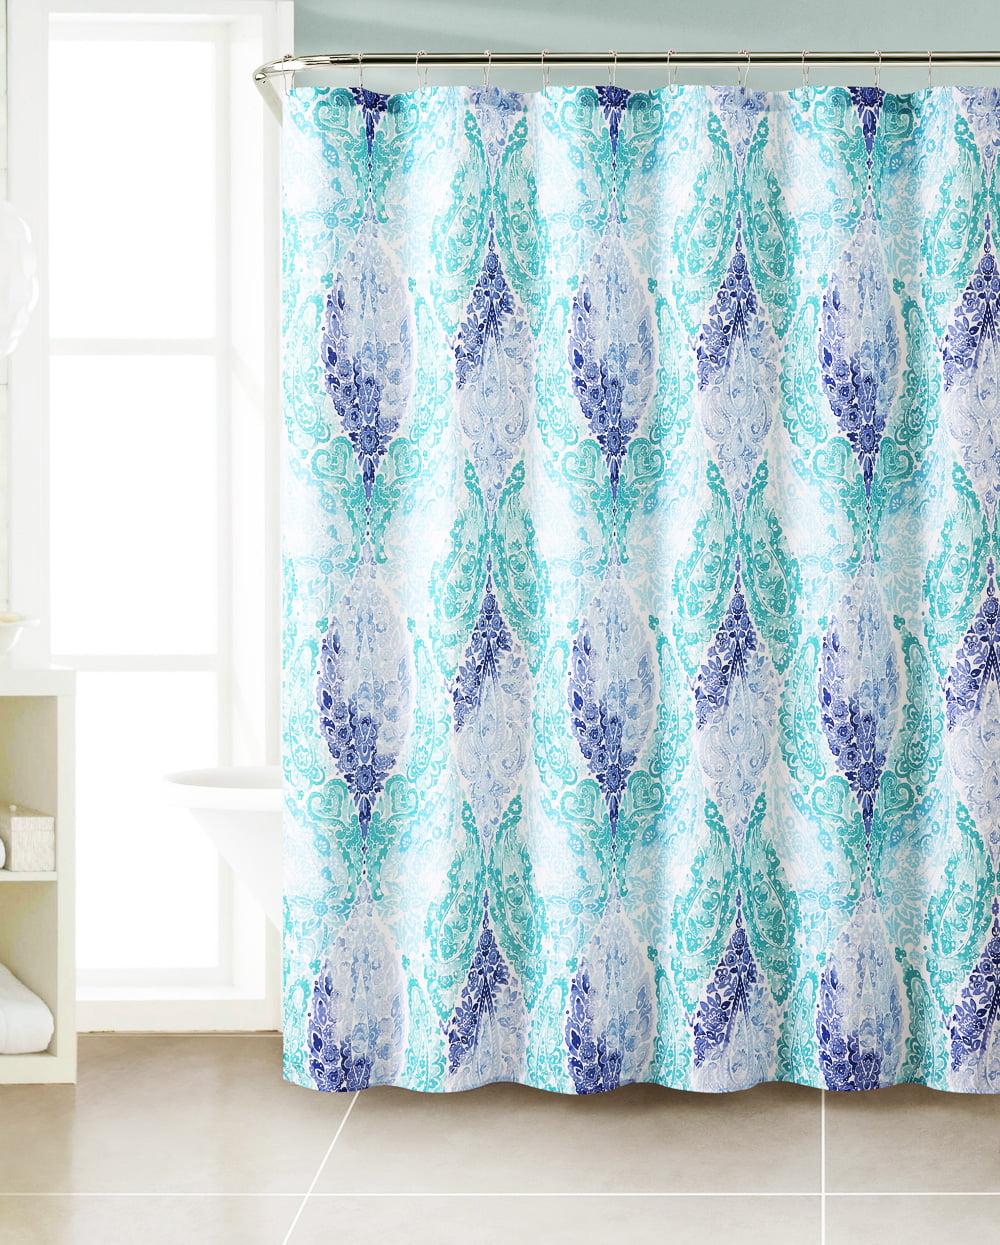 Purple Navy Blue White Fabric Shower Curtain Chevron Paisley Bathroom Bath 72 in